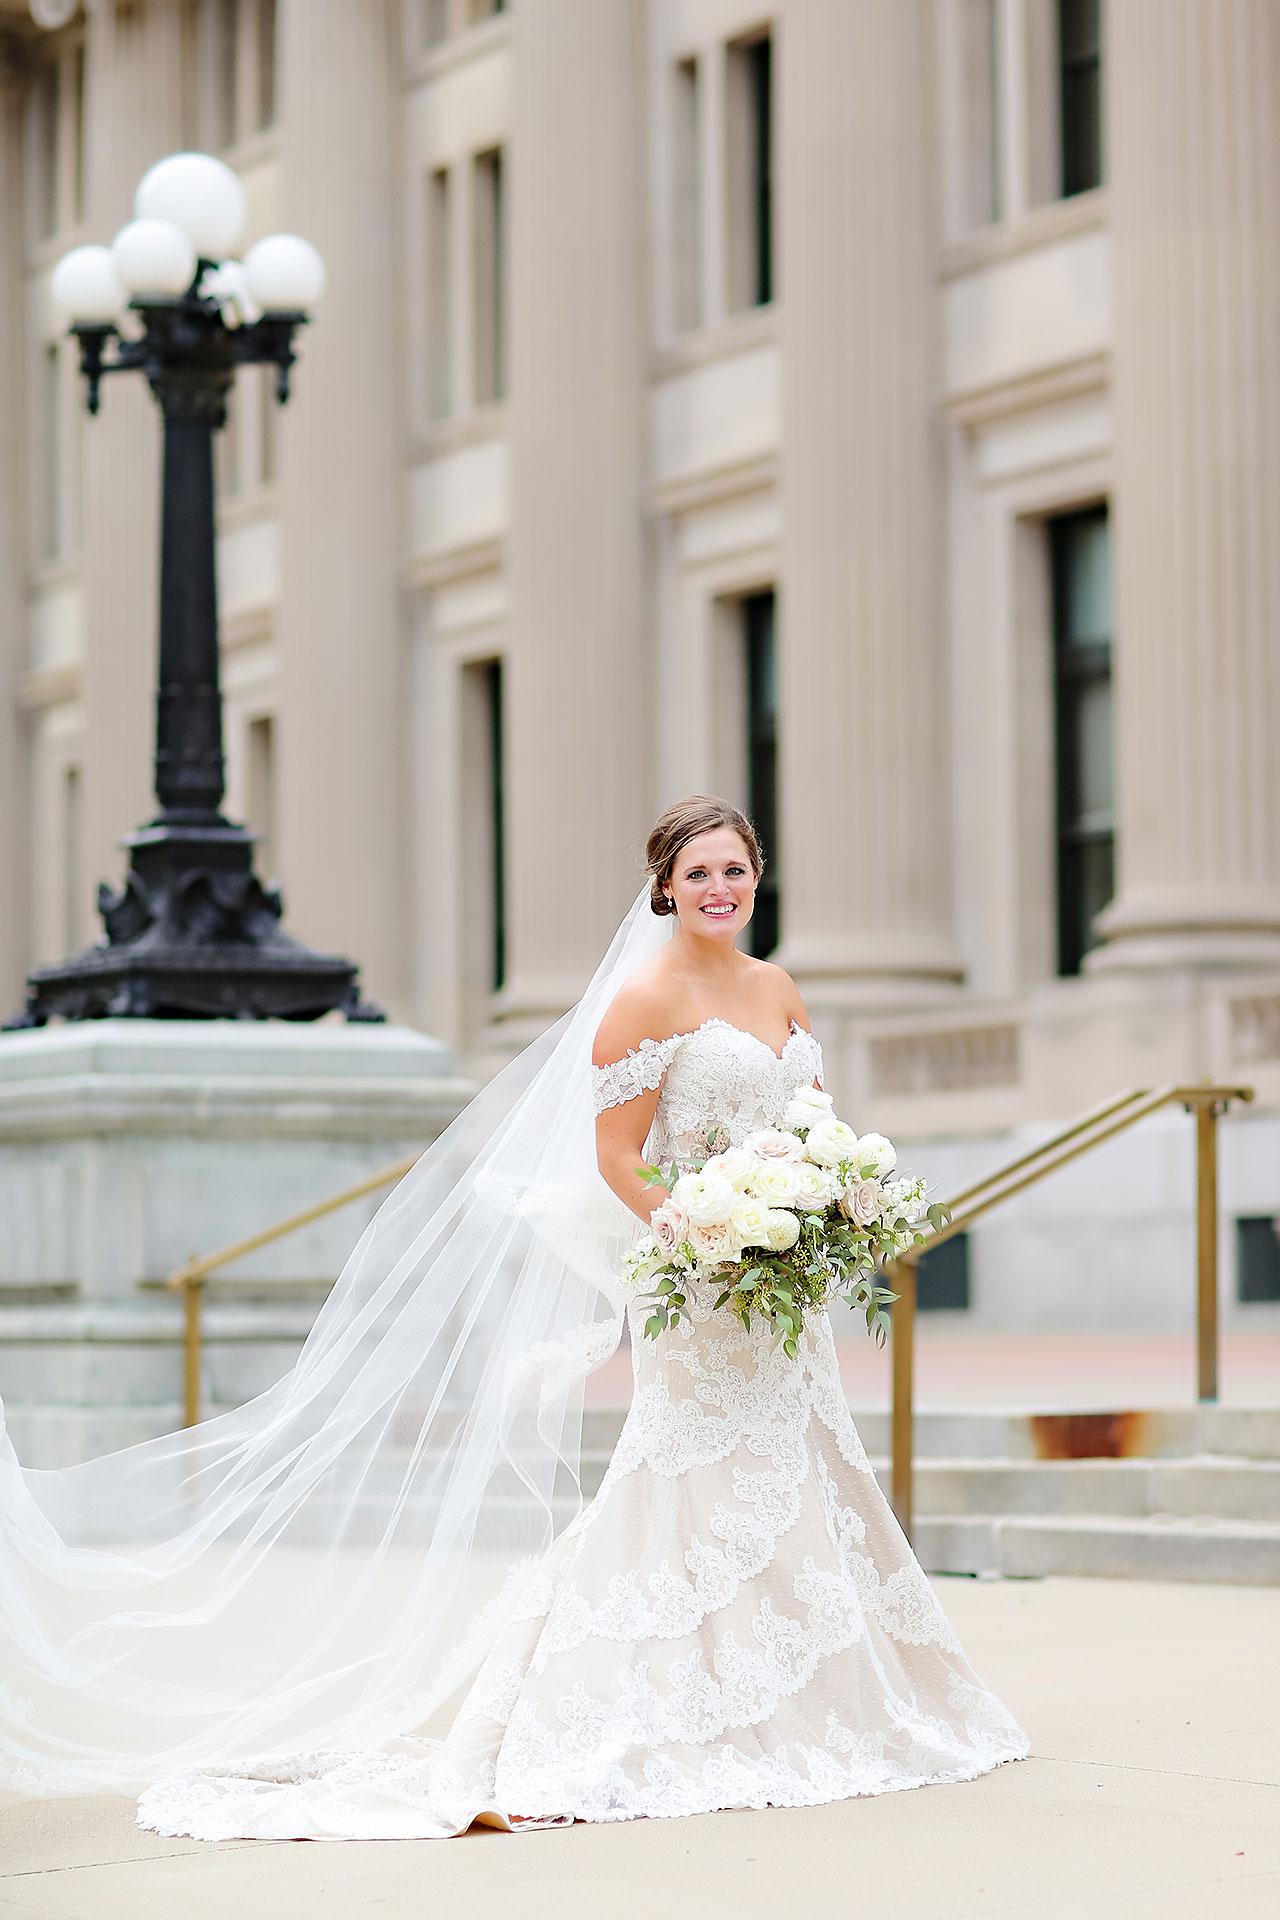 Erika Scott Regions Tower Indianapolis Wedding 201